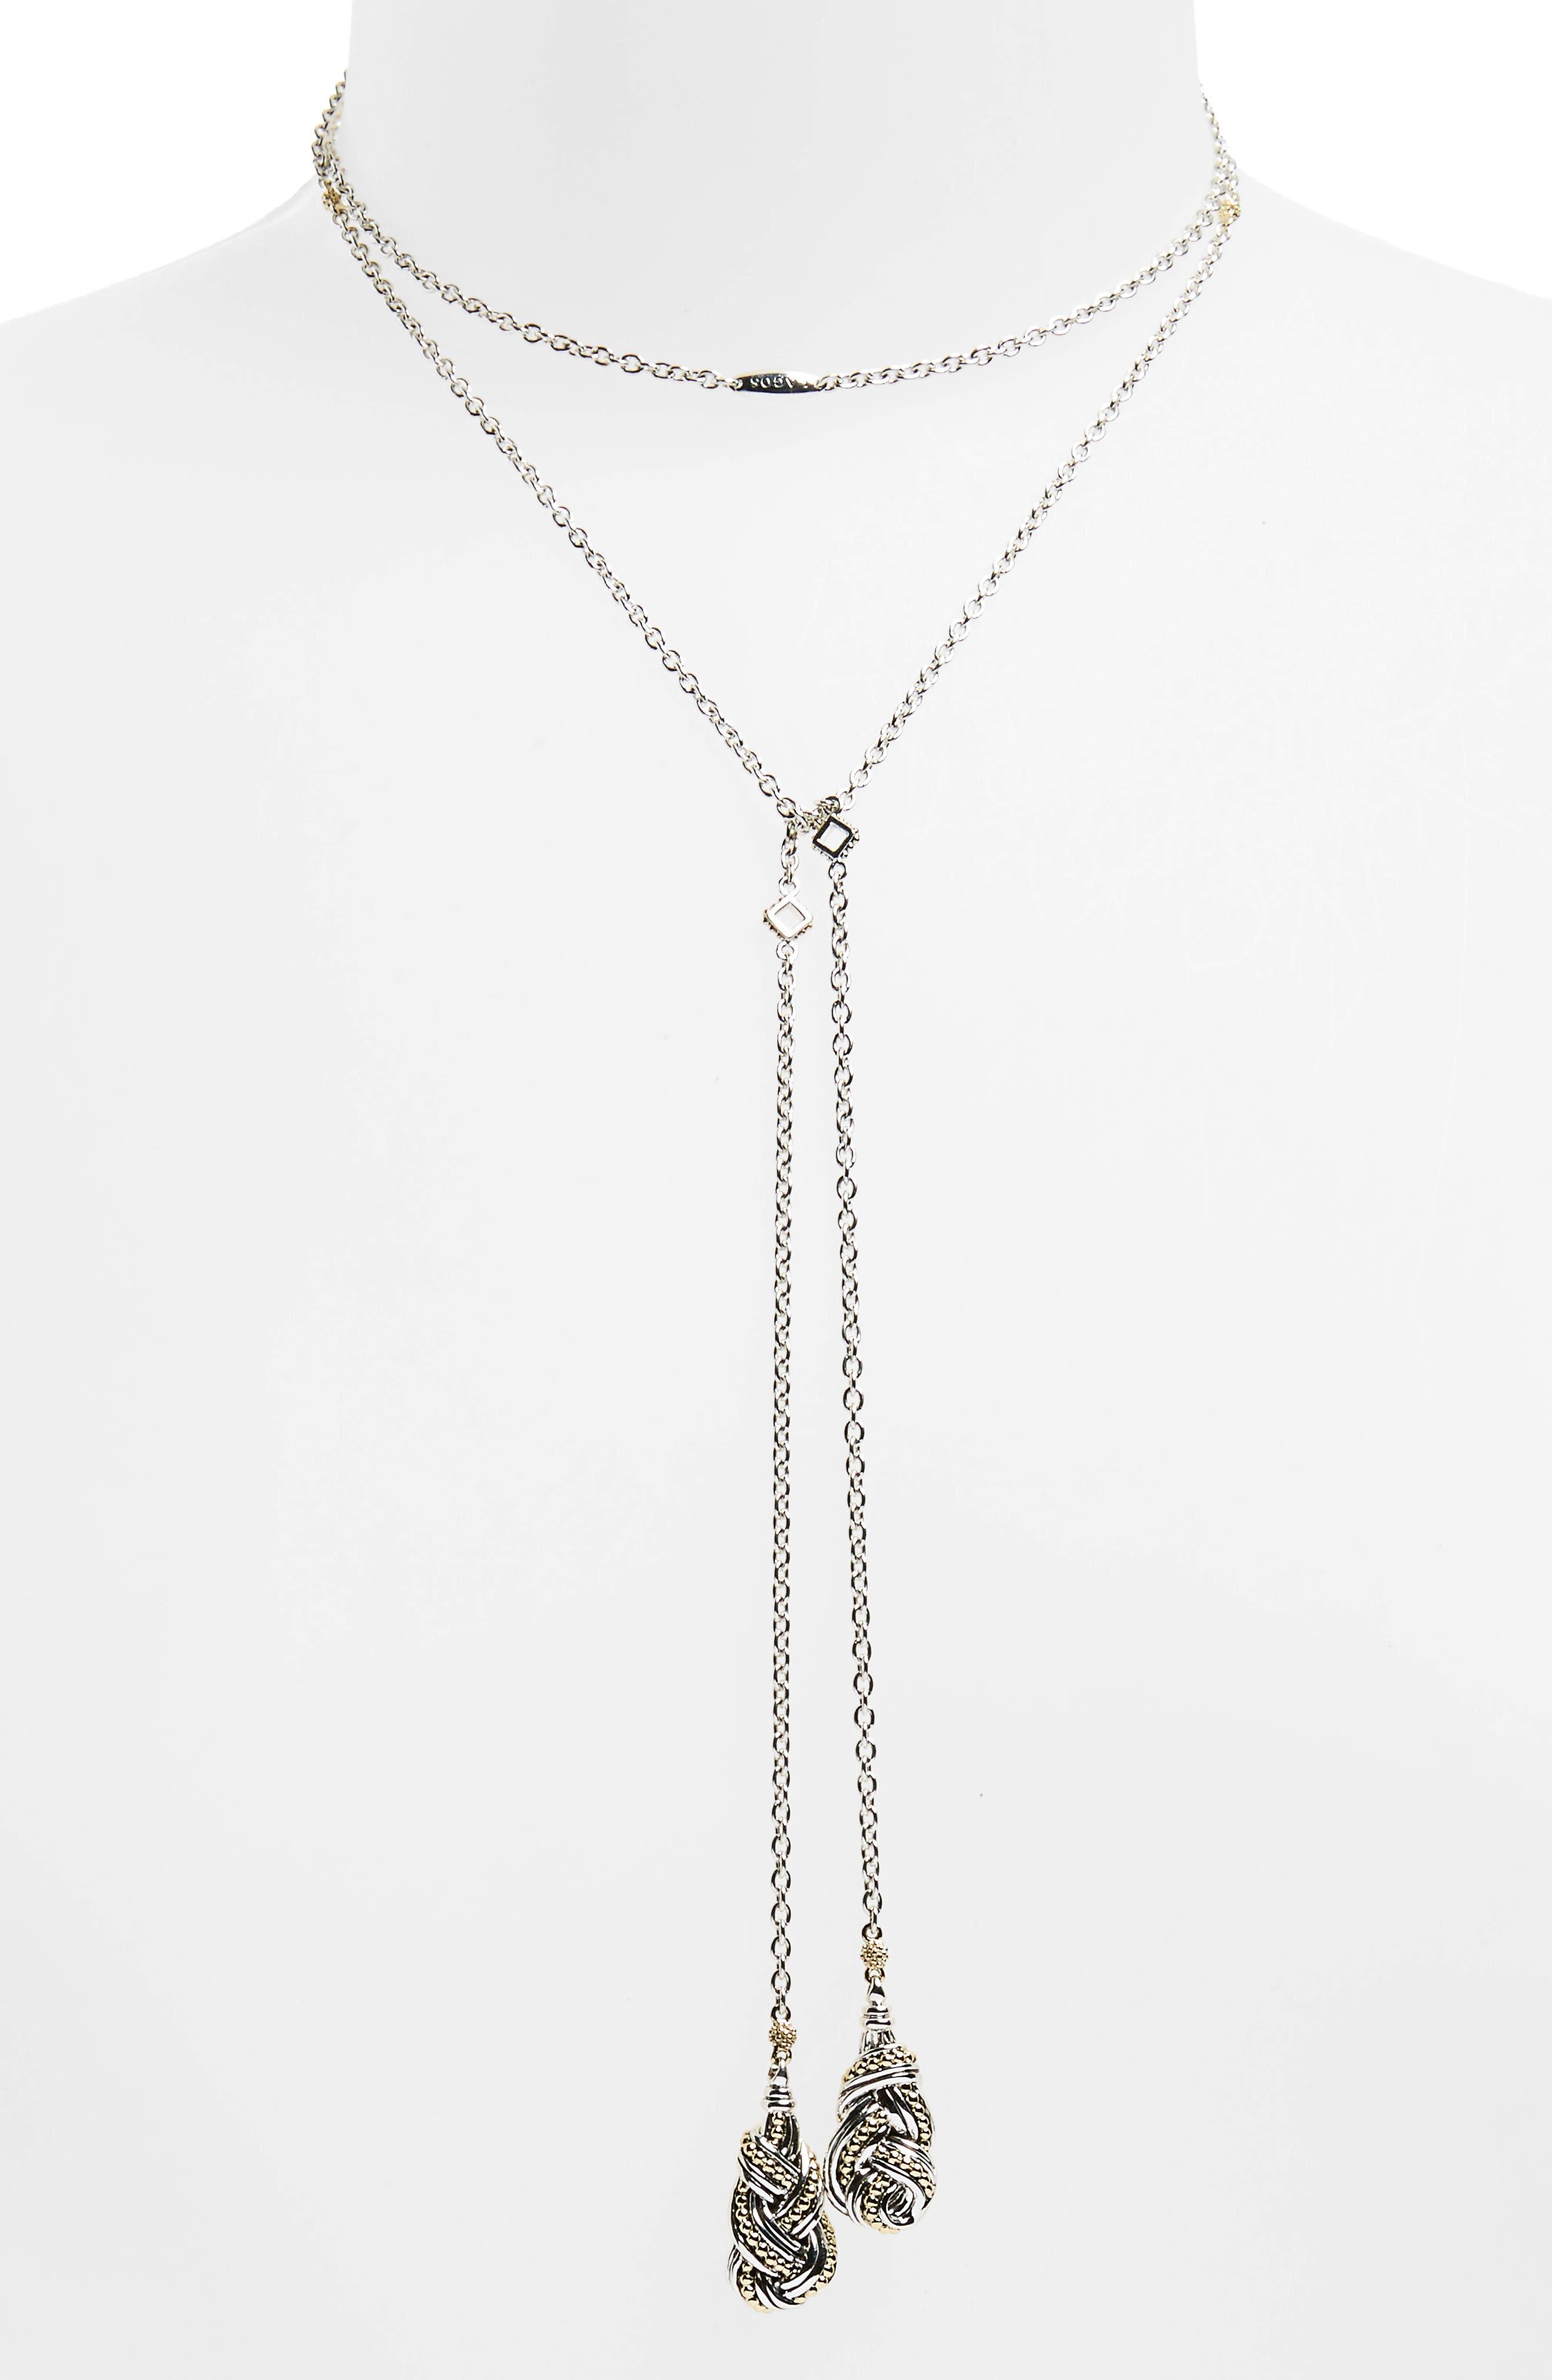 Main Image - LAGOS Torsade Lariat Necklace